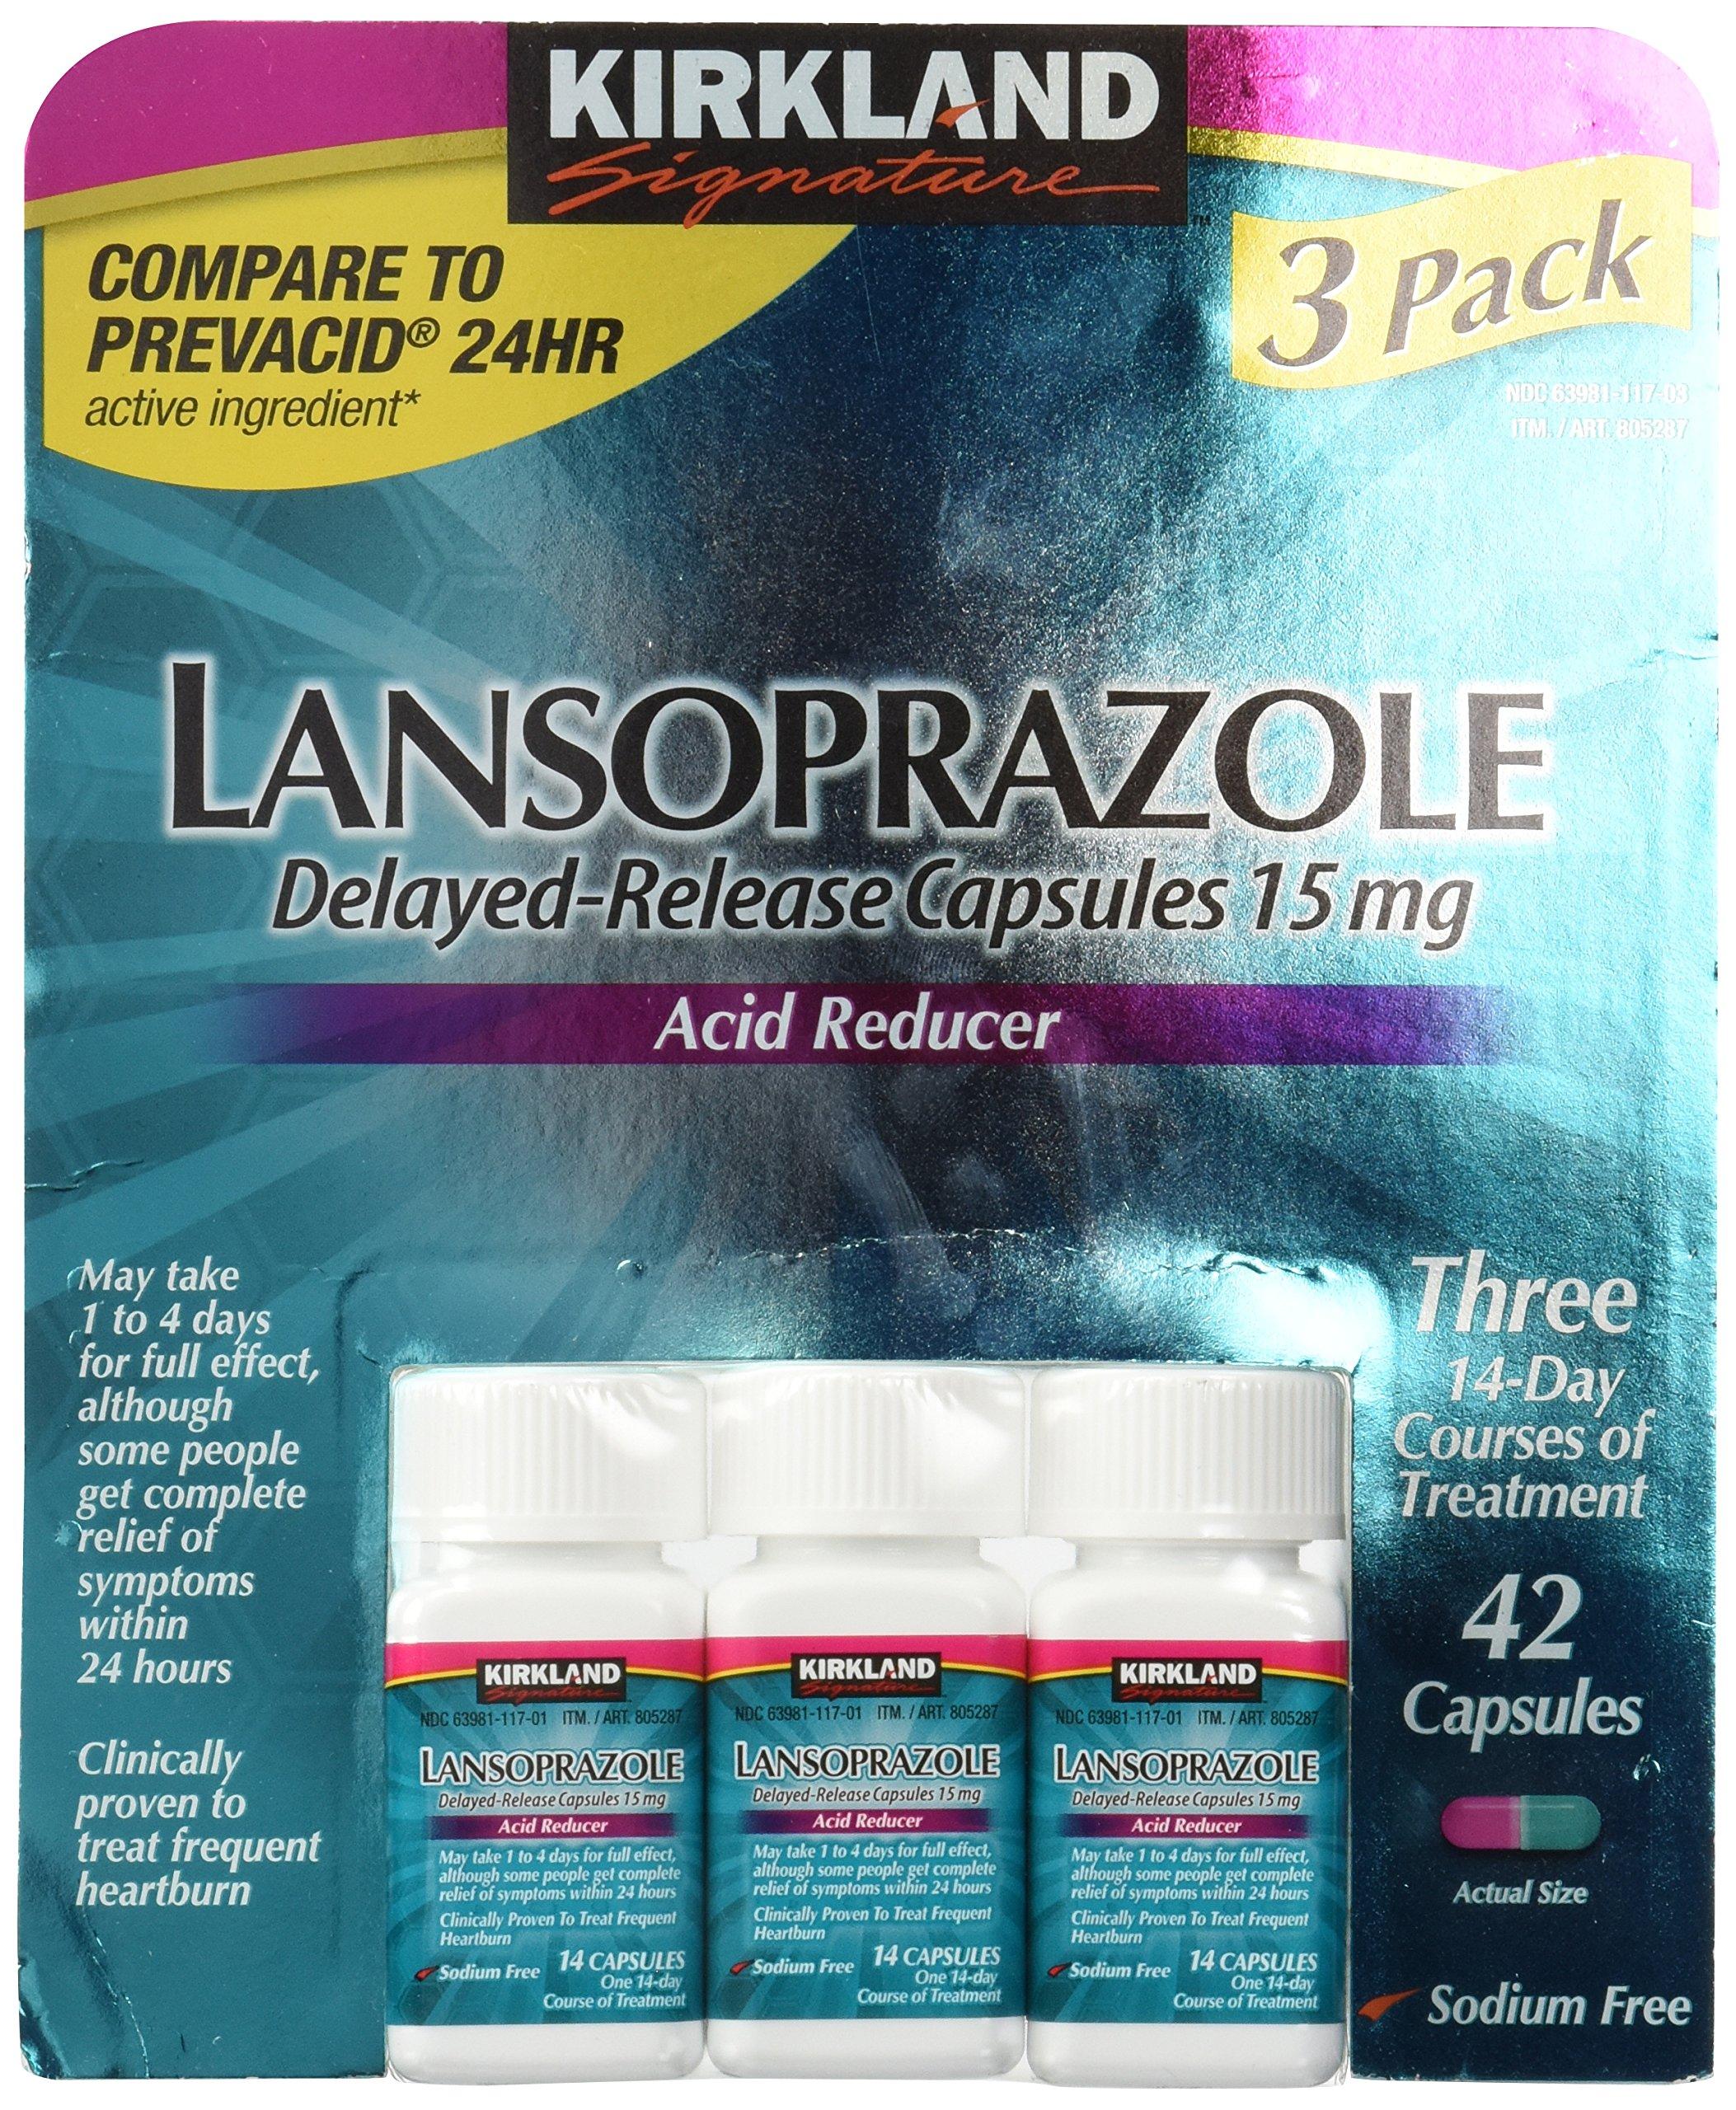 Kirkland Lansoprazole 3 Pack Delayed-Release Total 42 Capsules by Kirkland Signature